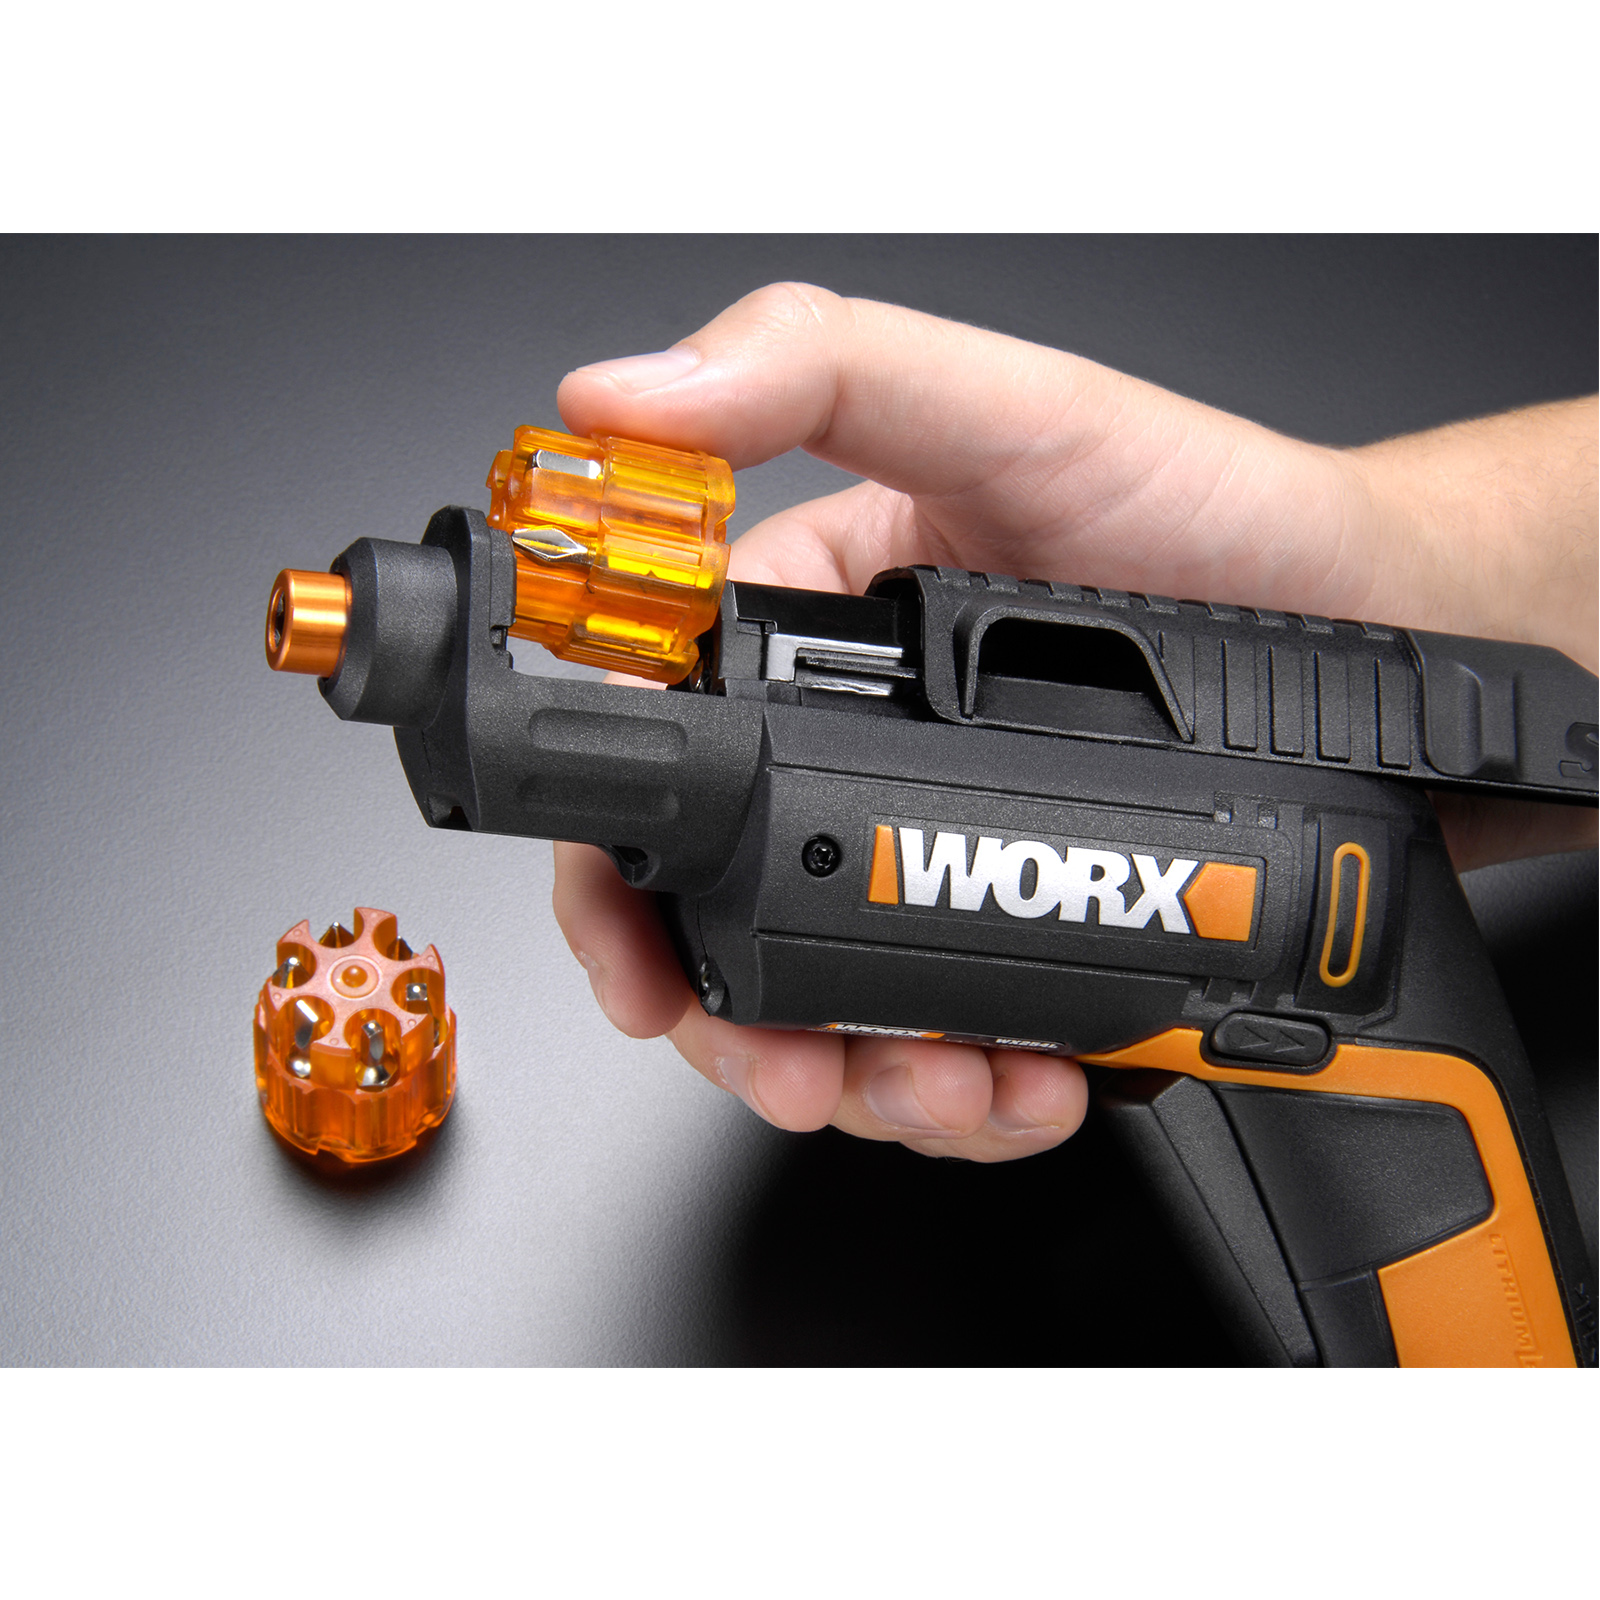 Worx WORX Semi-automatic Driver